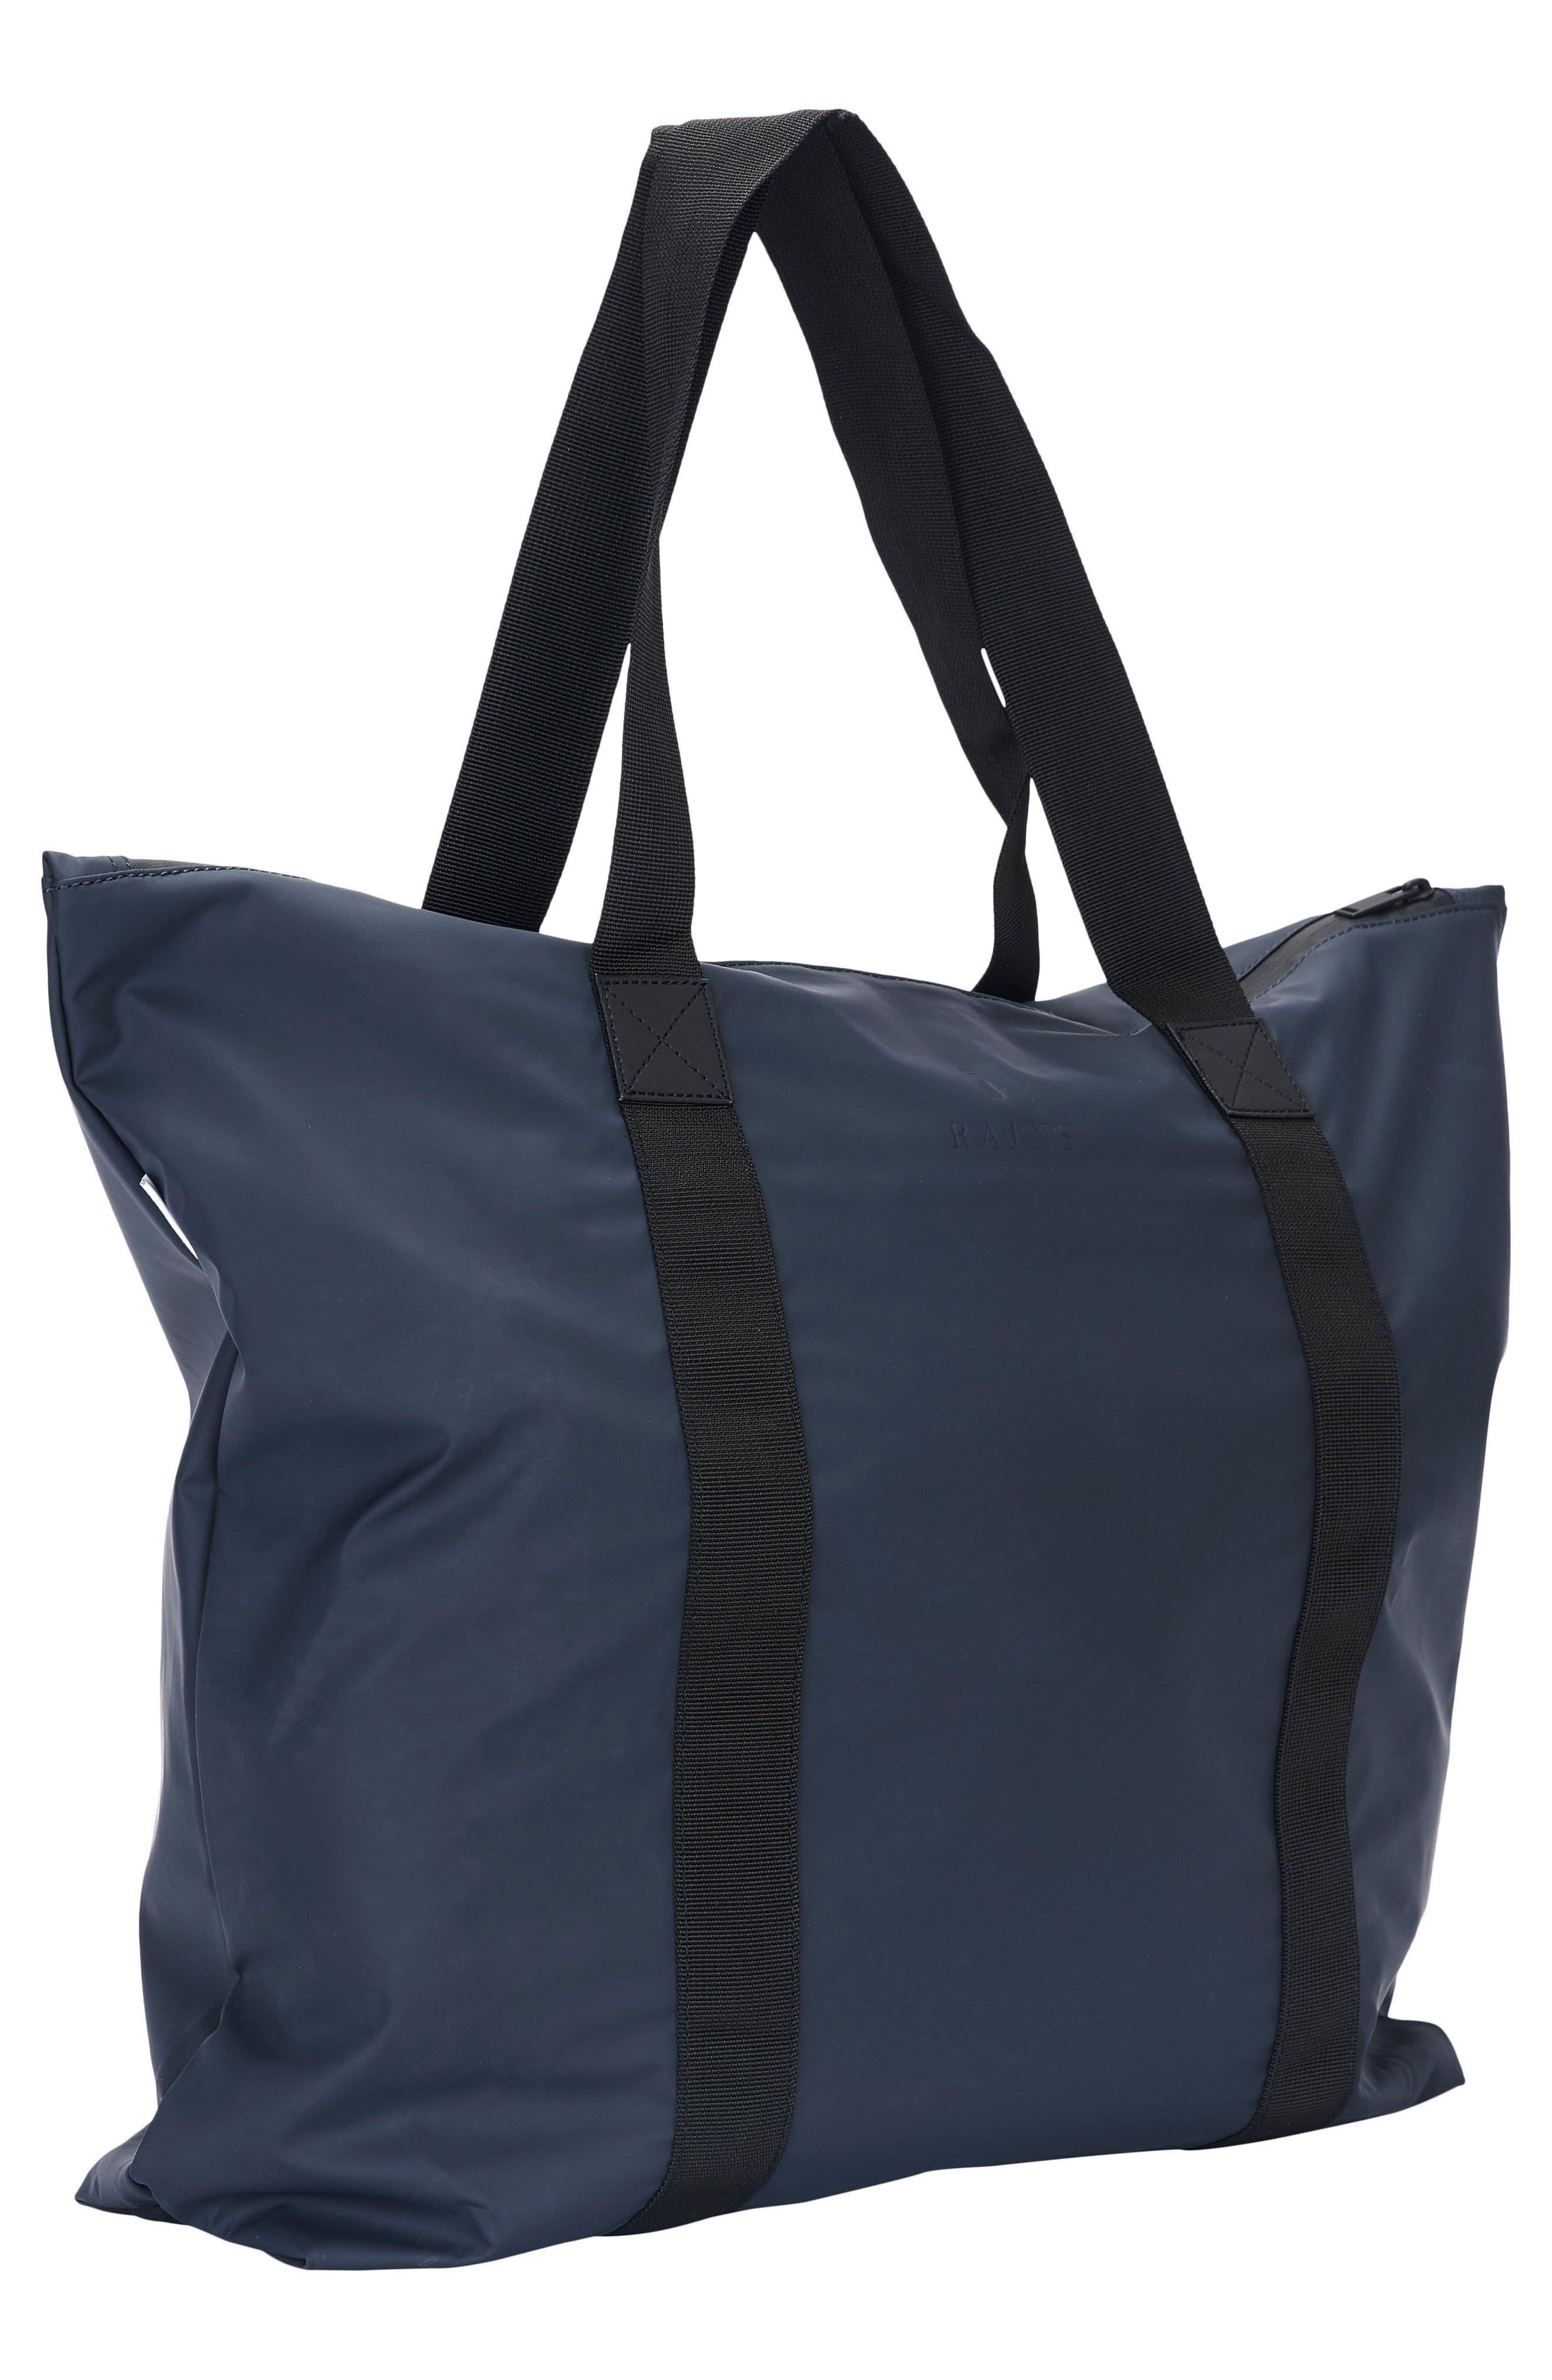 Waterproof Tote Bag,                             Alternate thumbnail 2, color,                             Blue